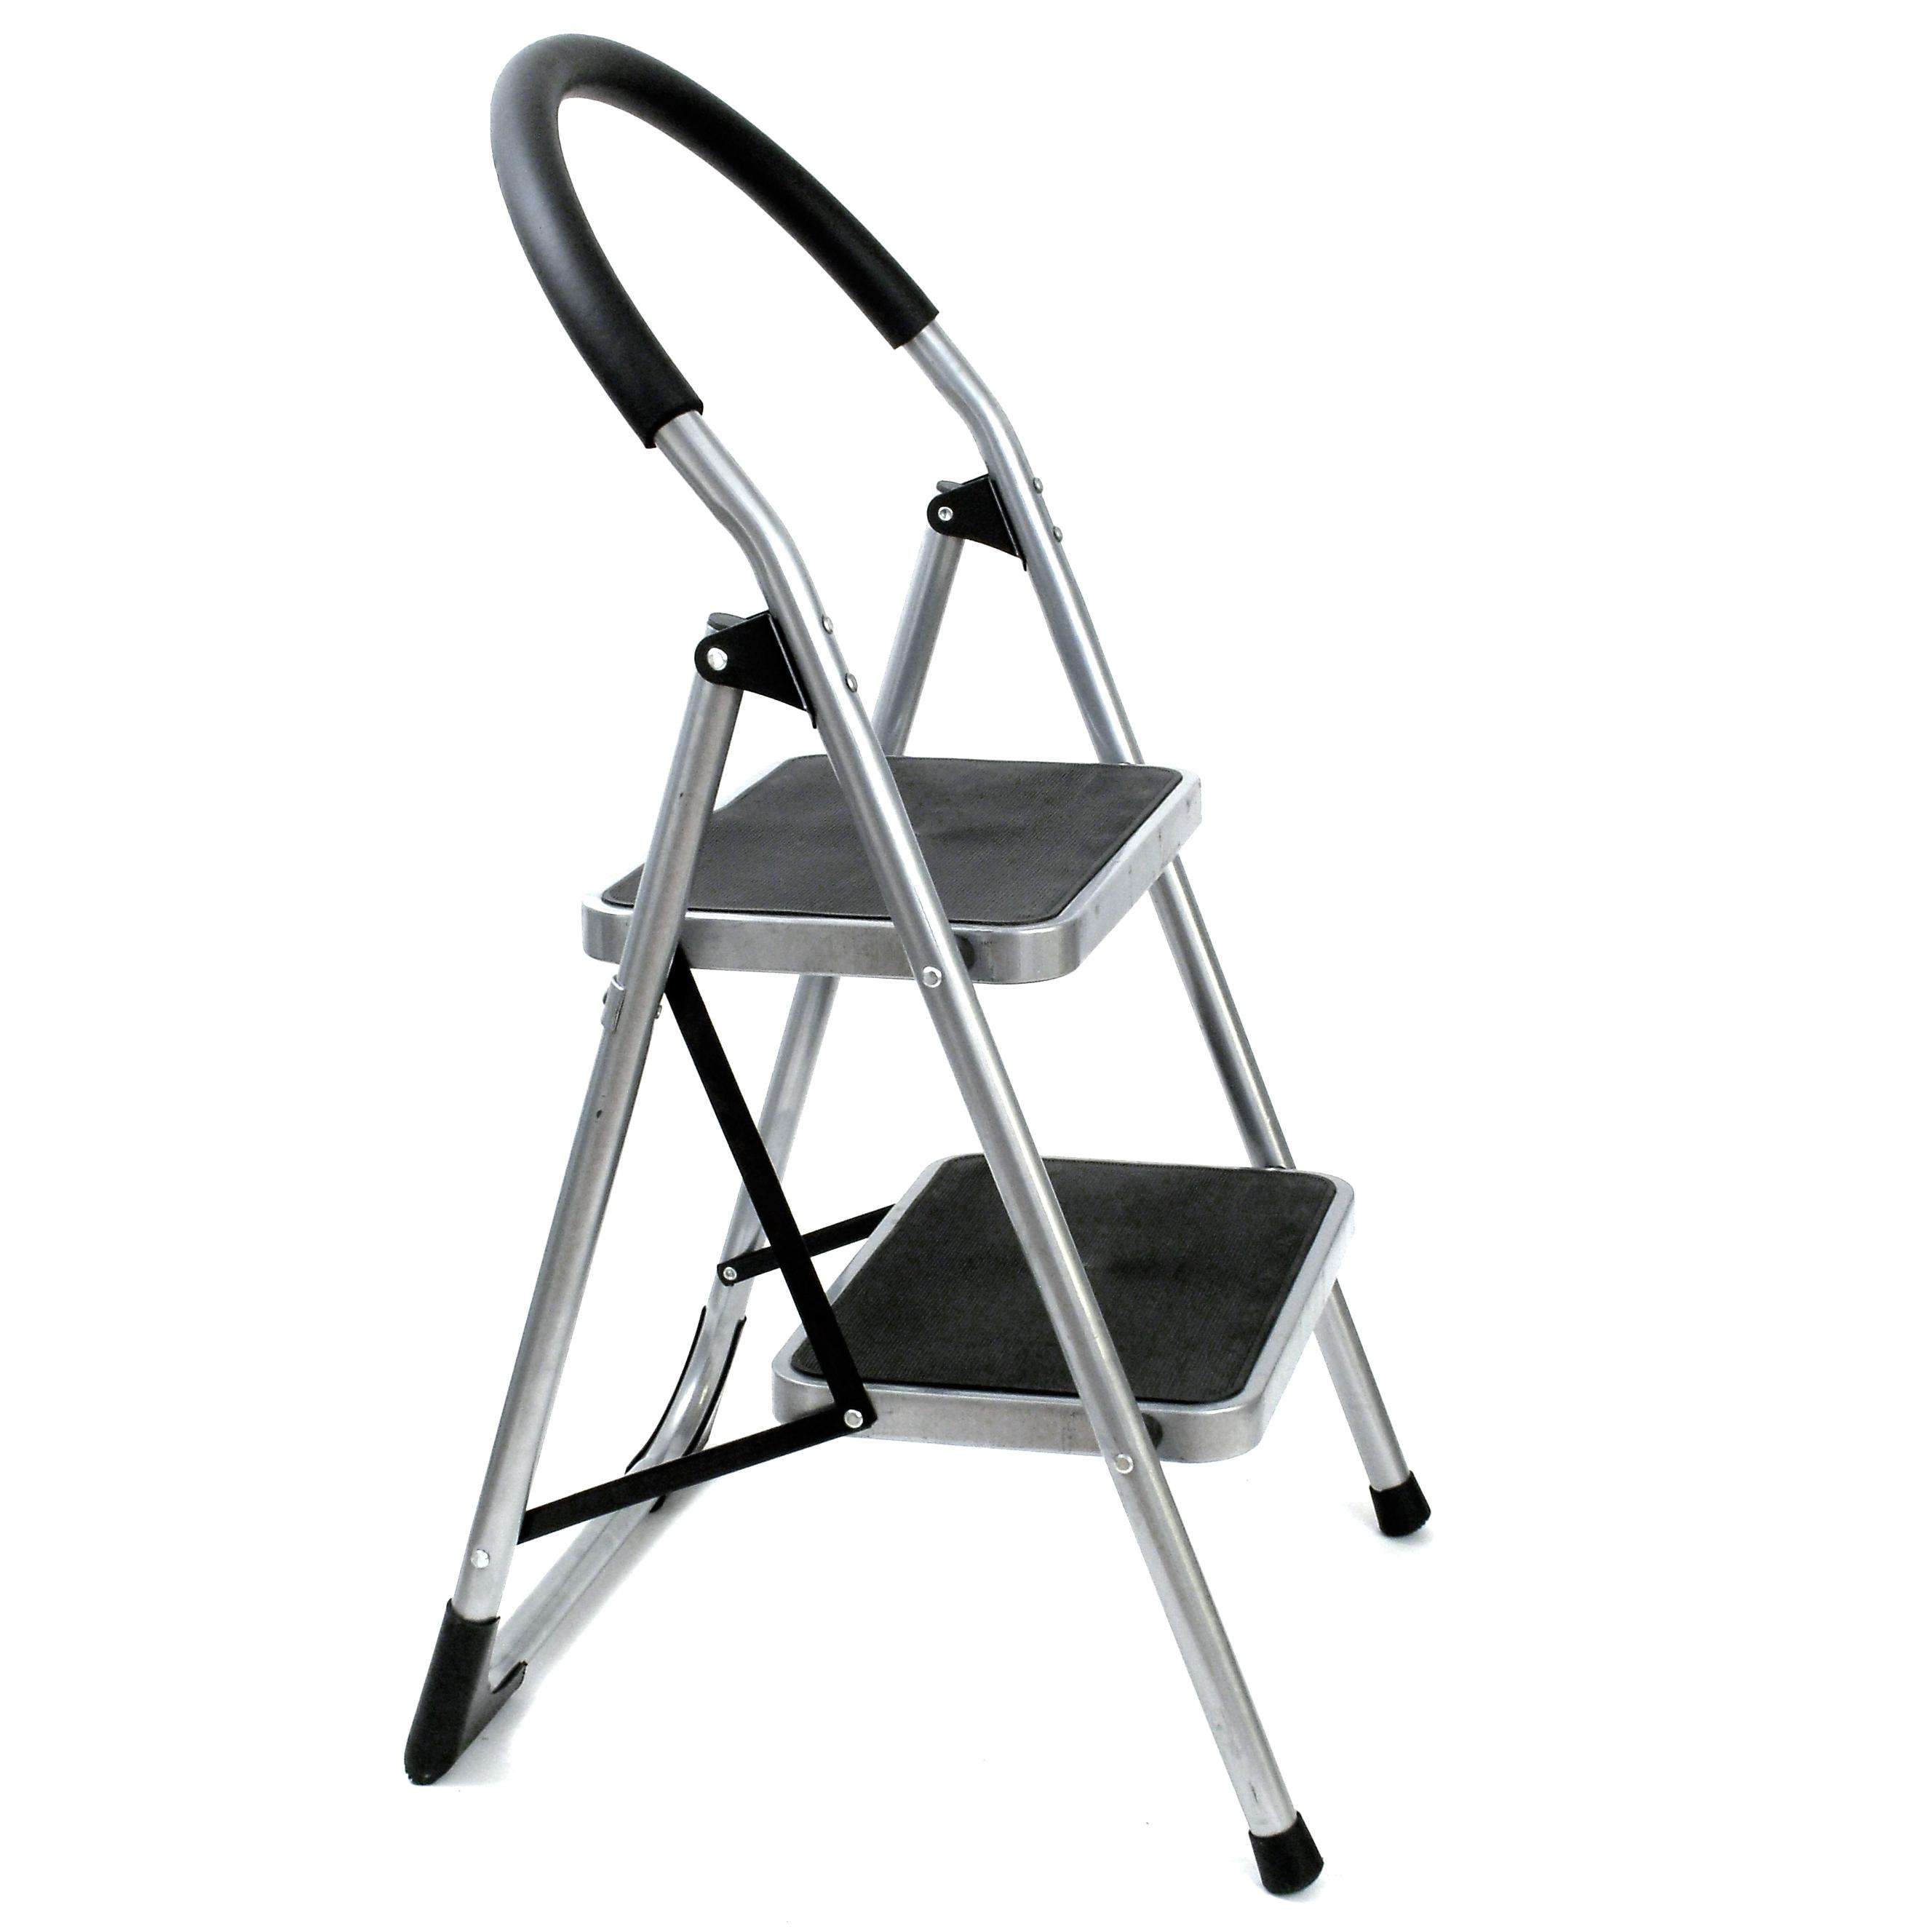 Plegable metal 2 escalera mano taburete silla seguro for Escaleras de aluminio usadas